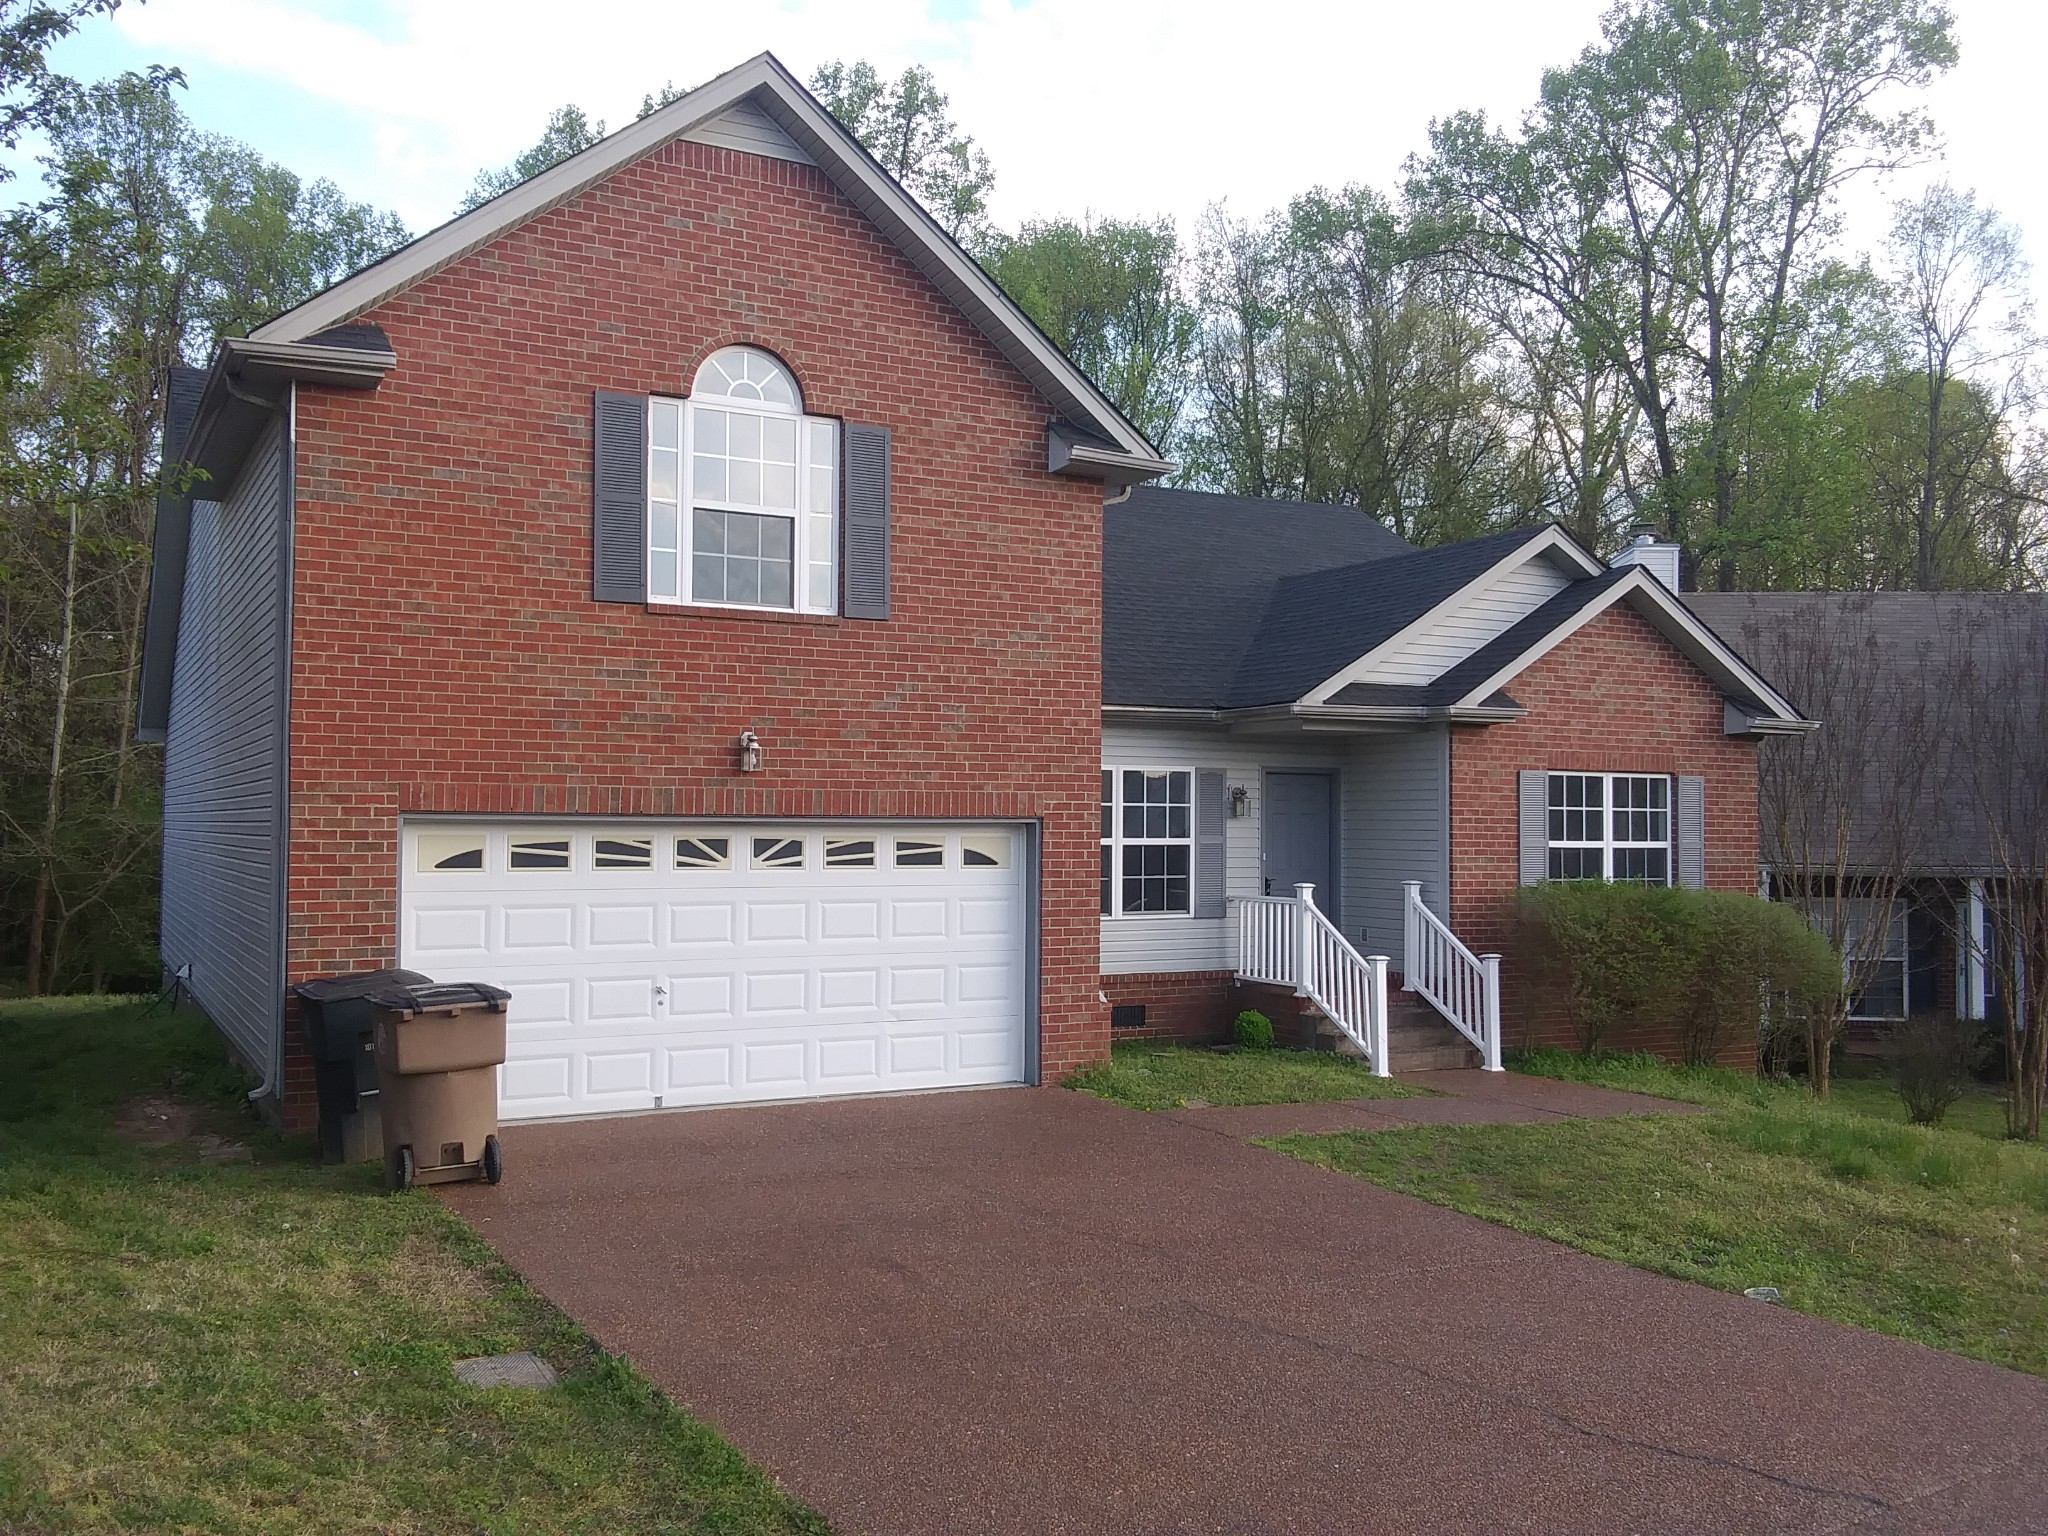 3117 Deercreek Trl, S, Nashville, TN 37217 - Nashville, TN real estate listing